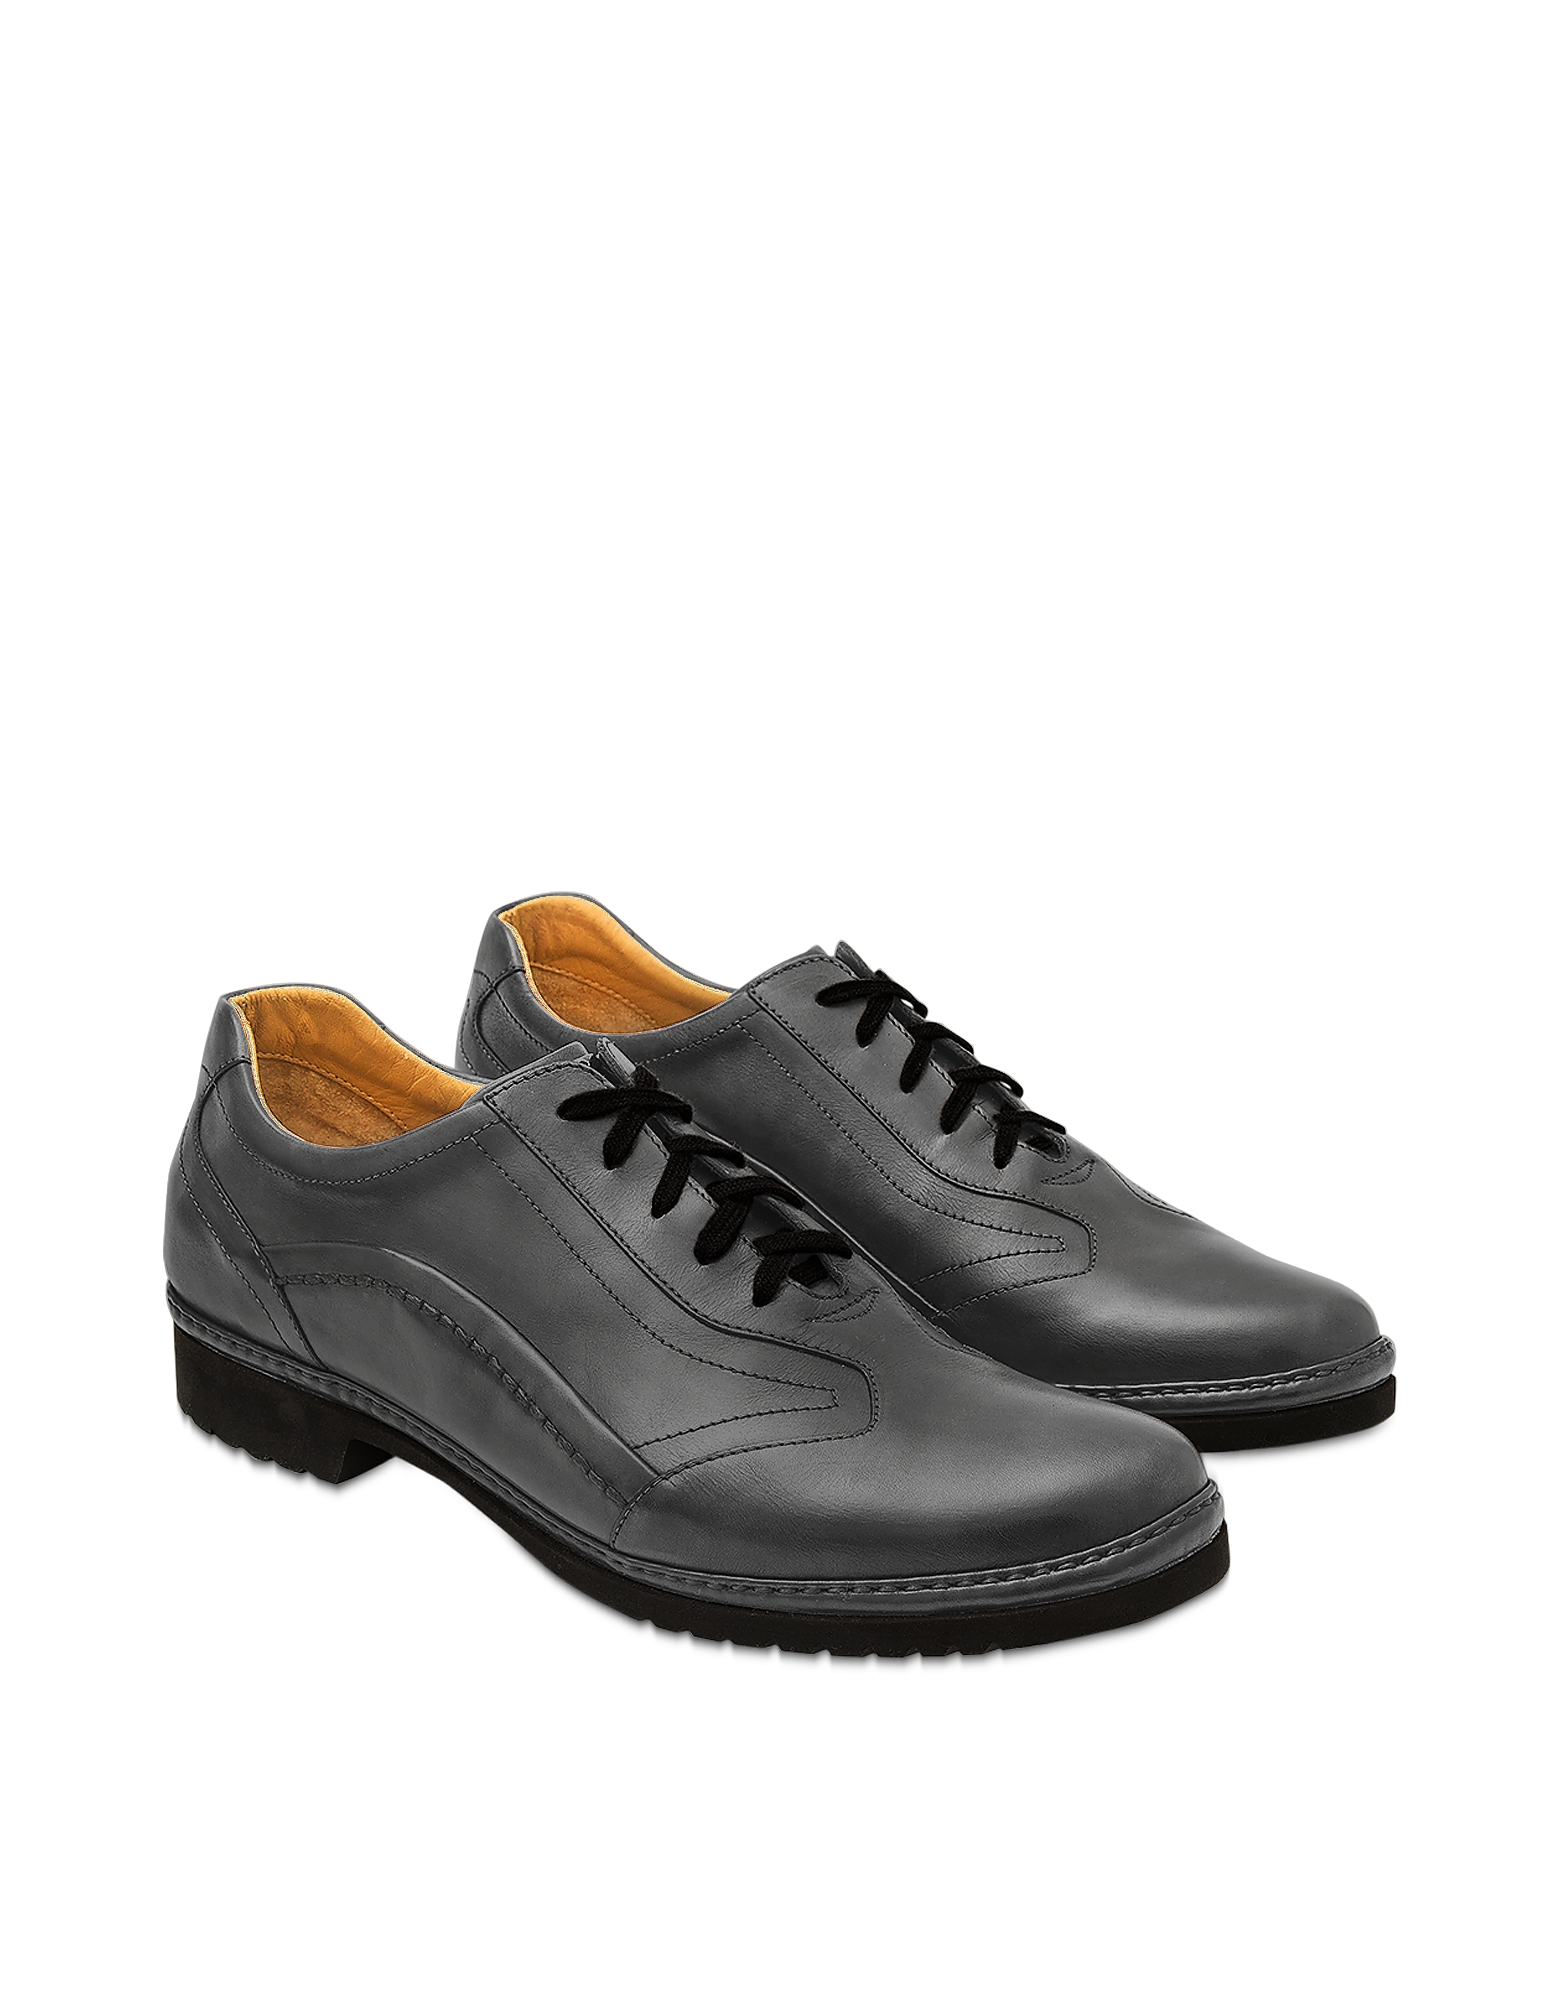 Pakerson Designer Shoes, Smoke Pienza Derby Shoe